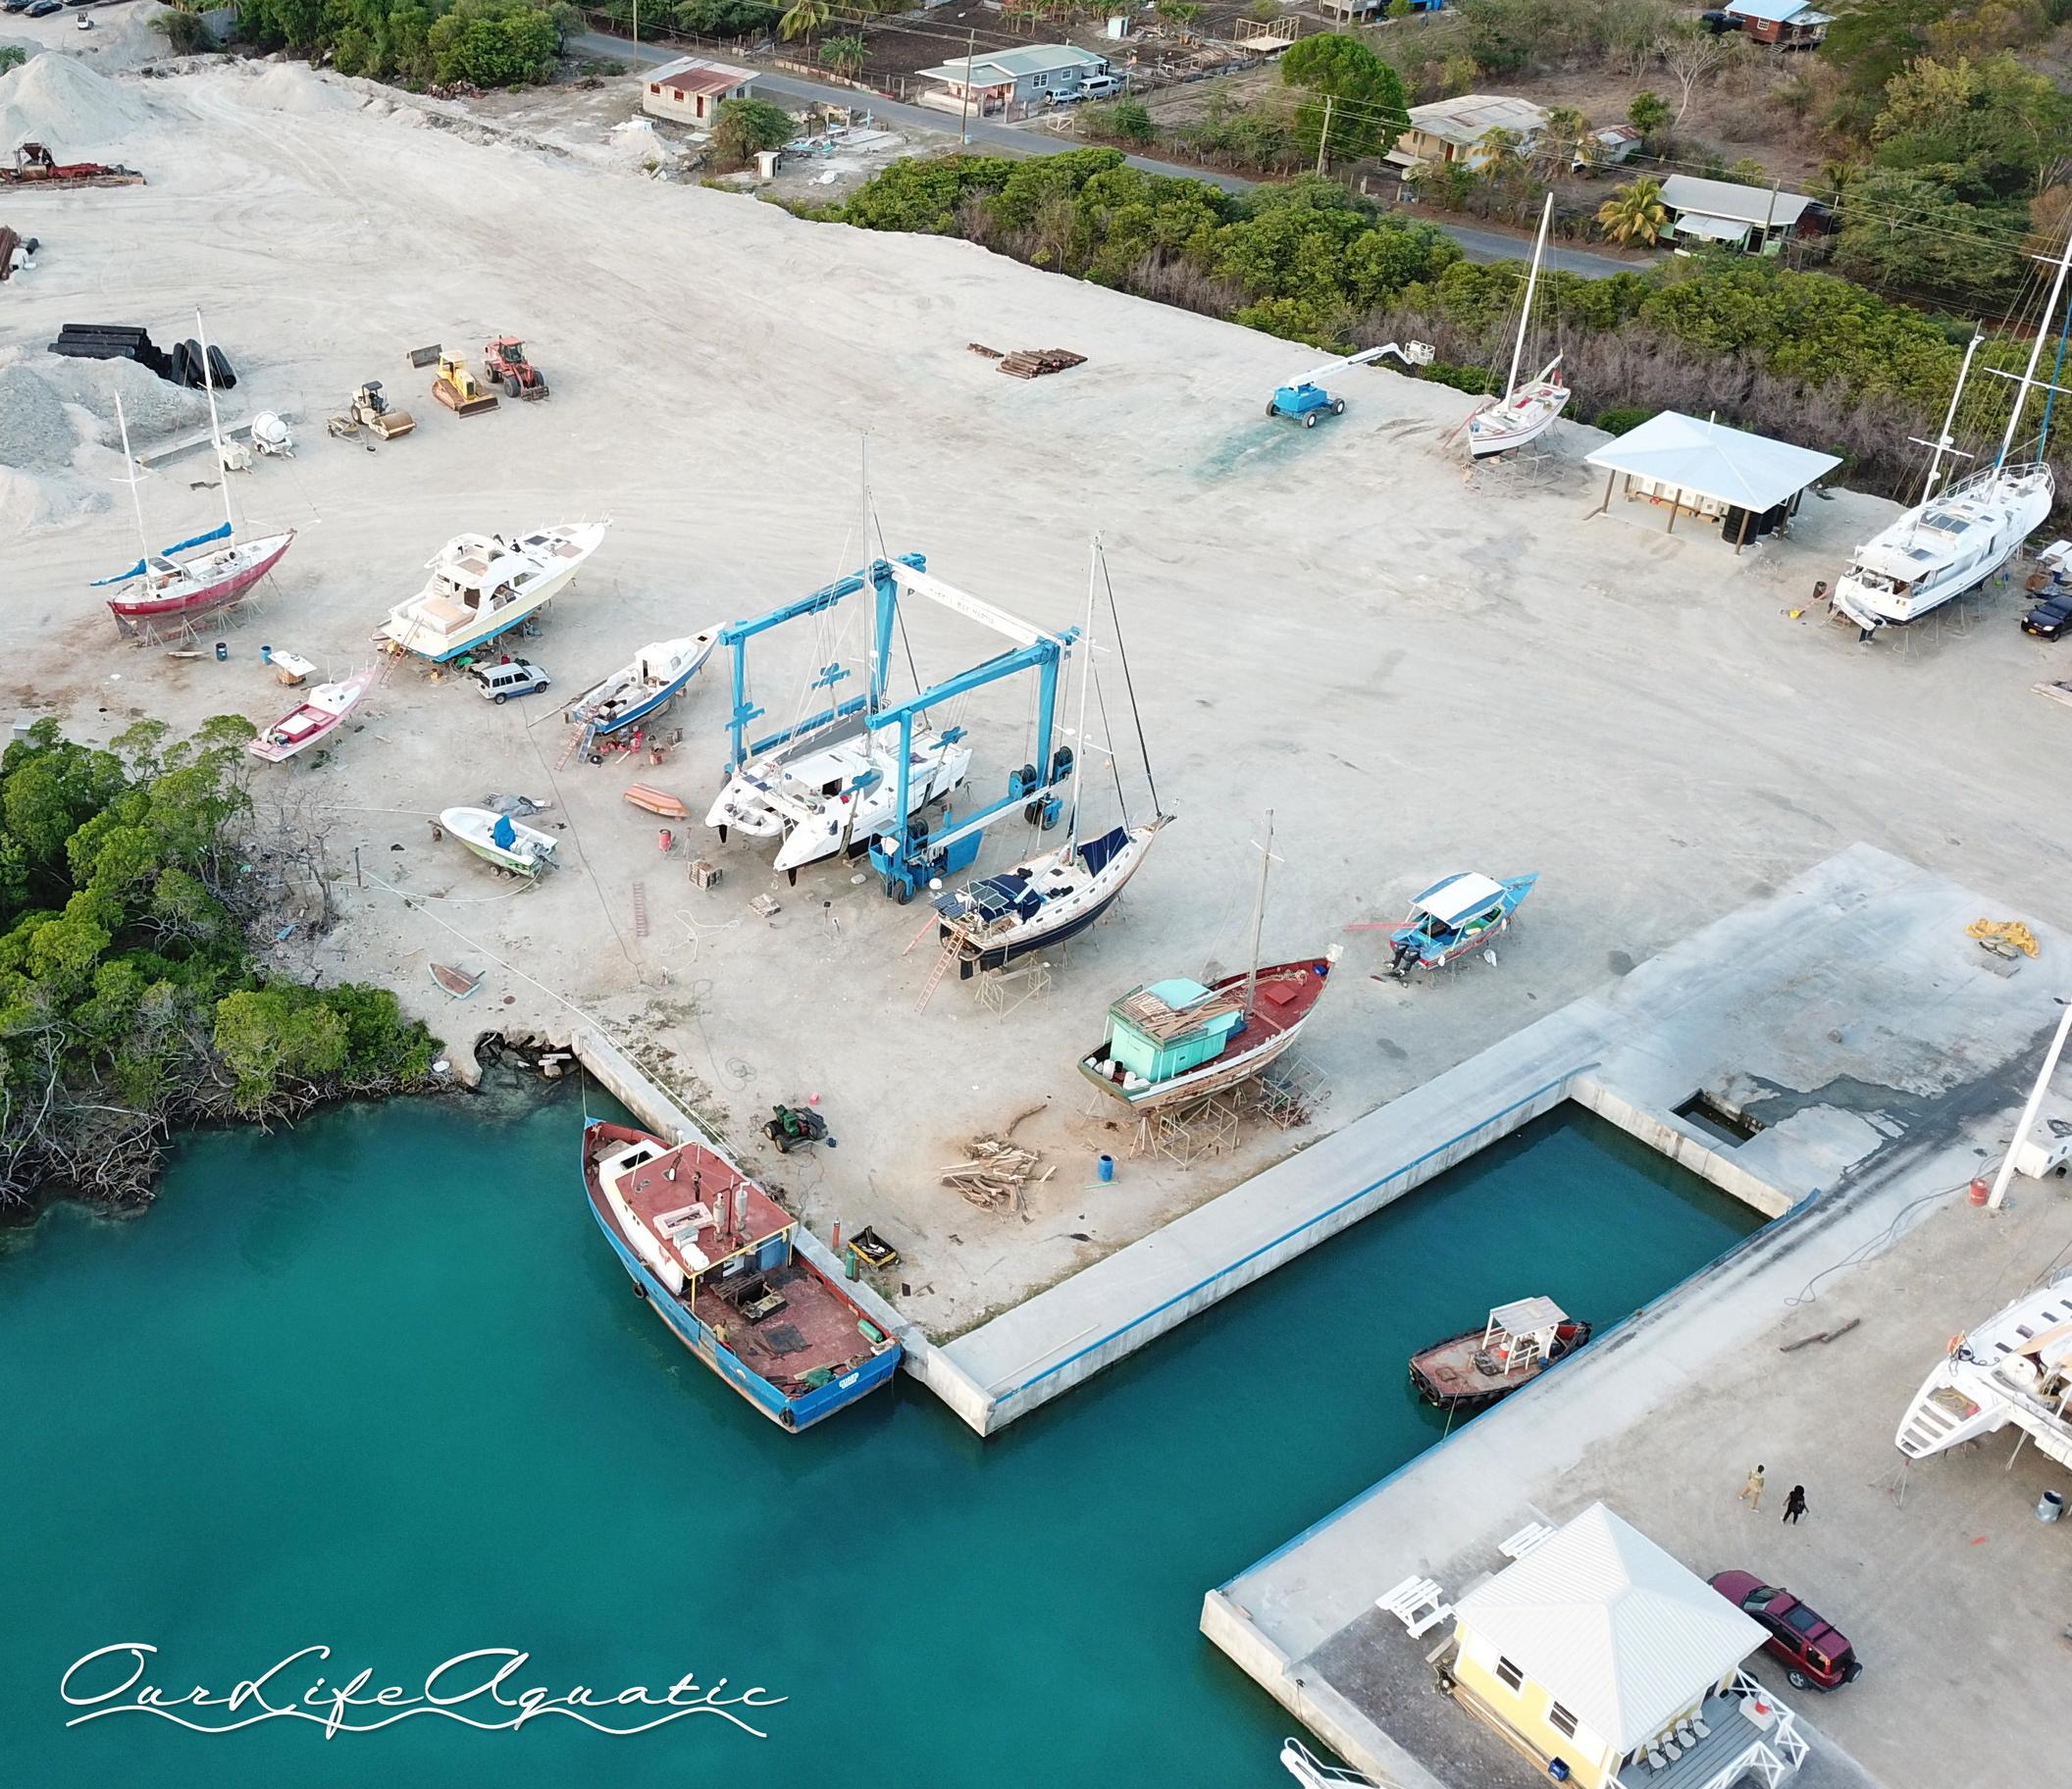 Pura Vida in the boat yard